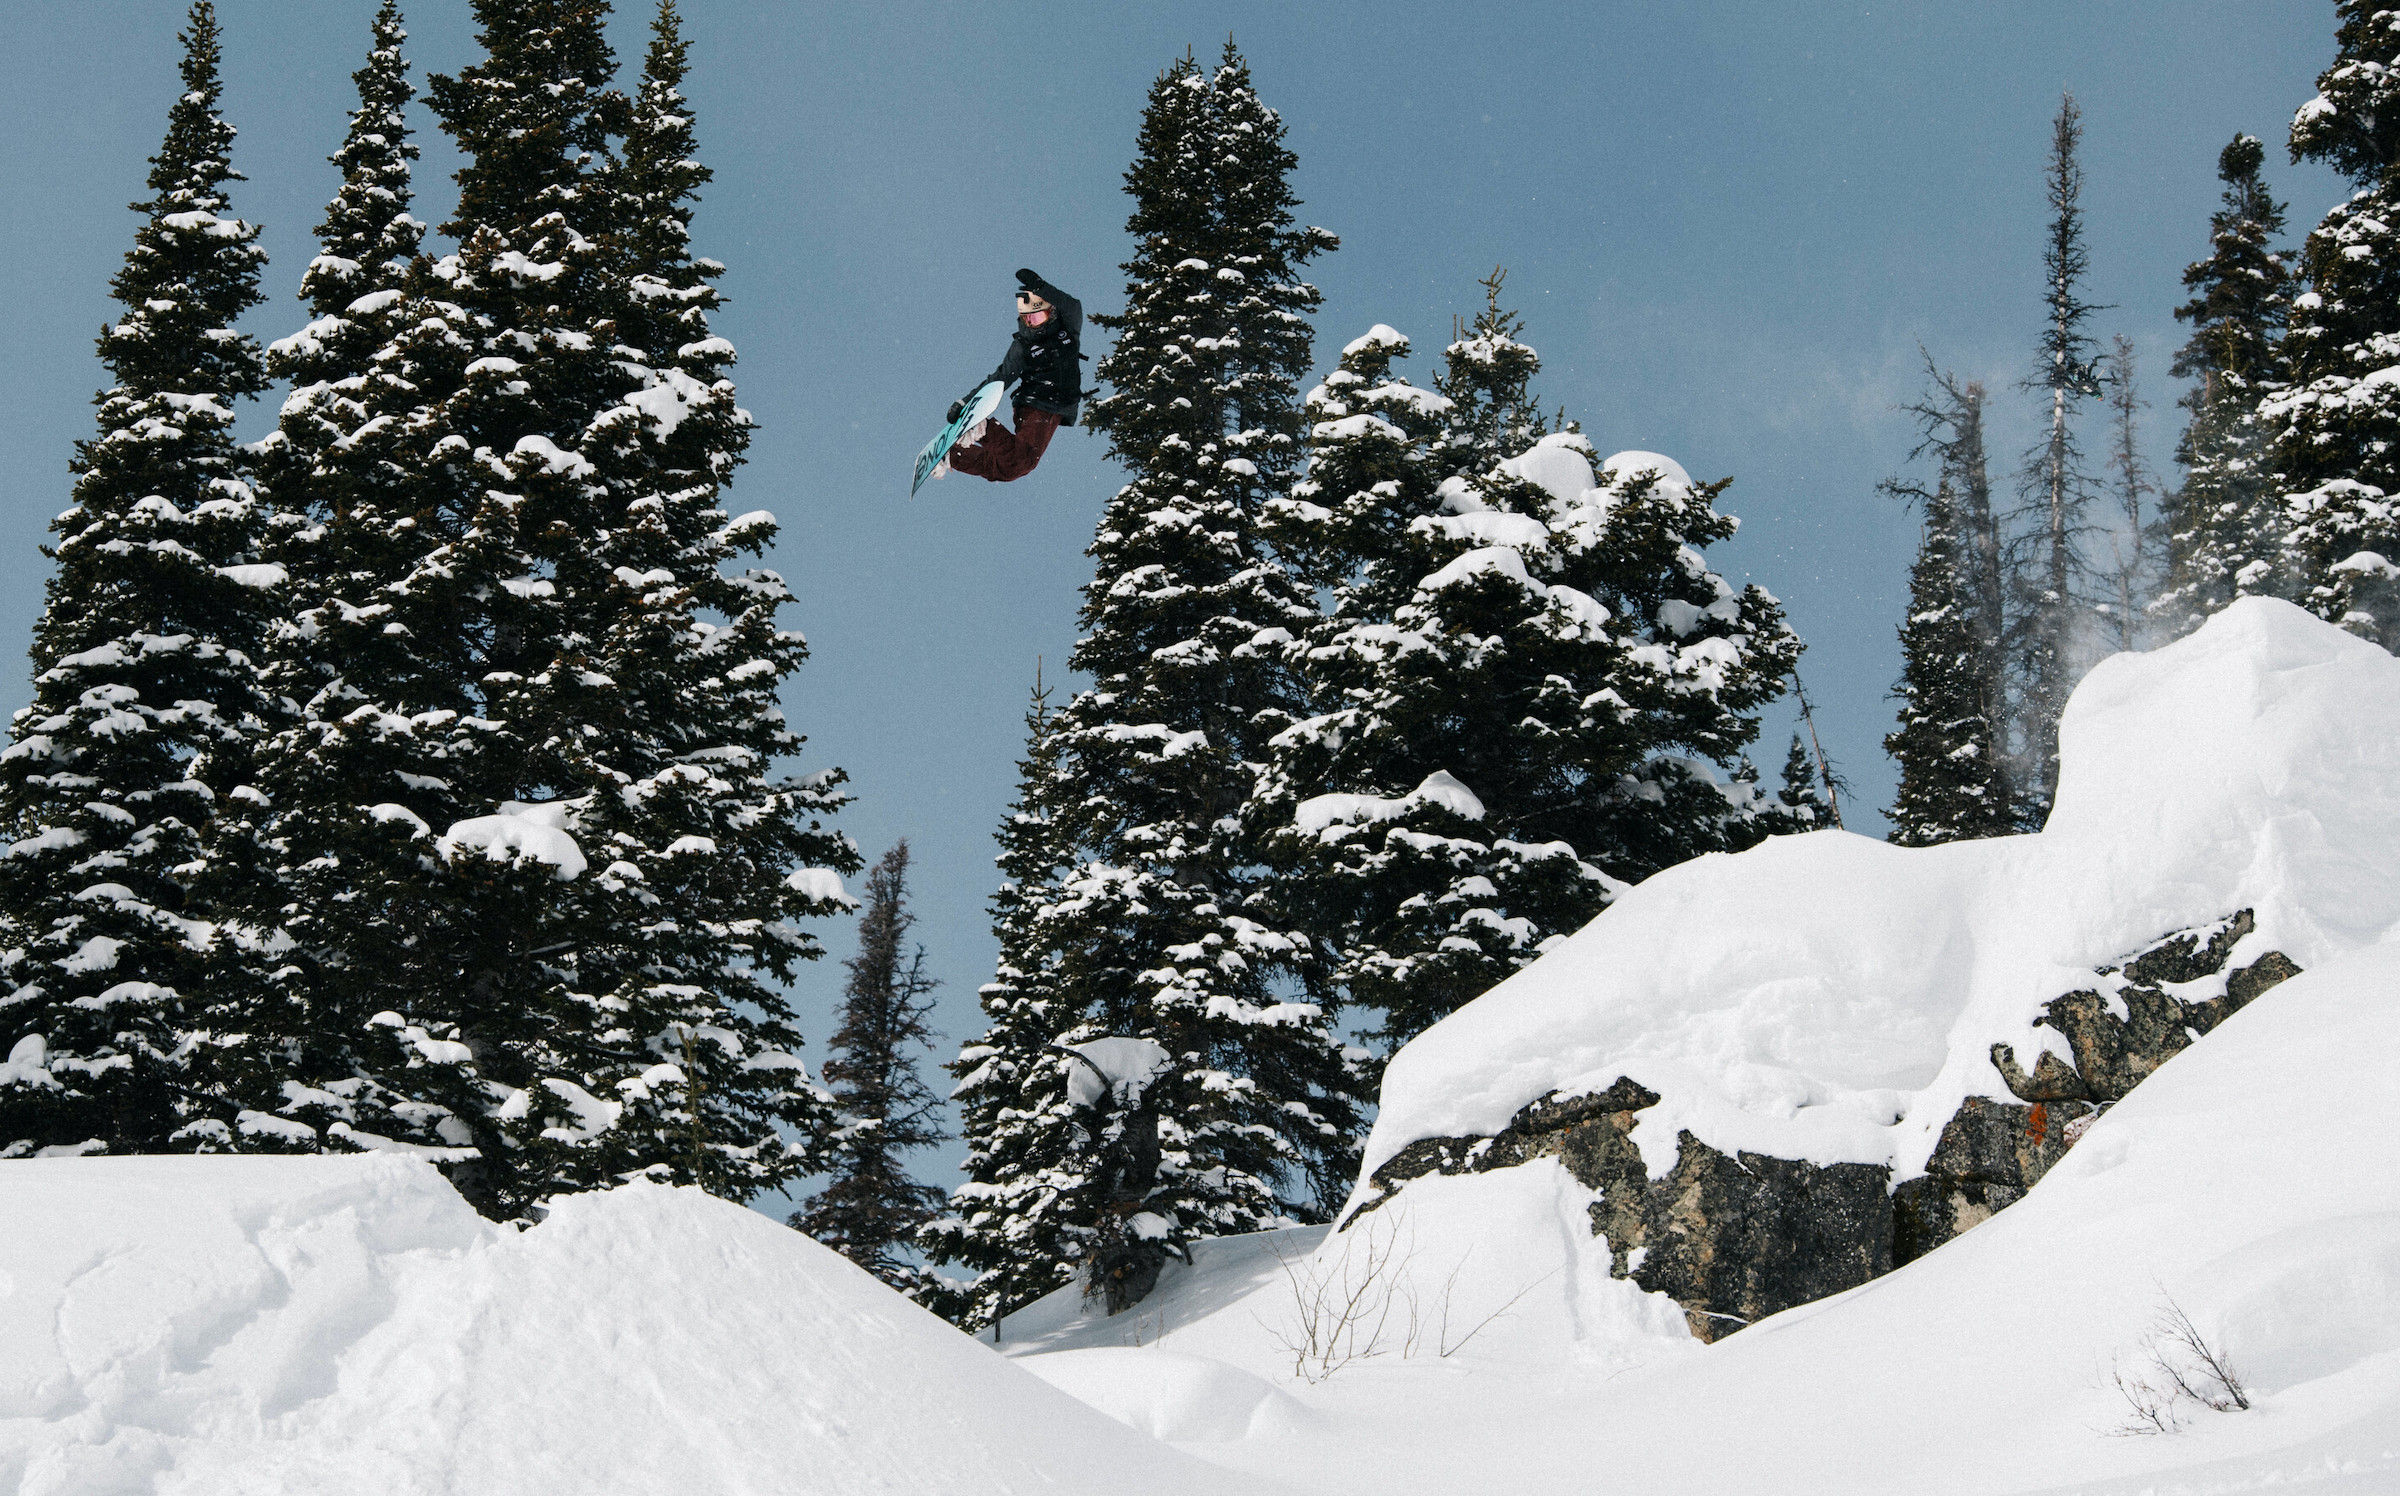 Elena Hight snowboarding